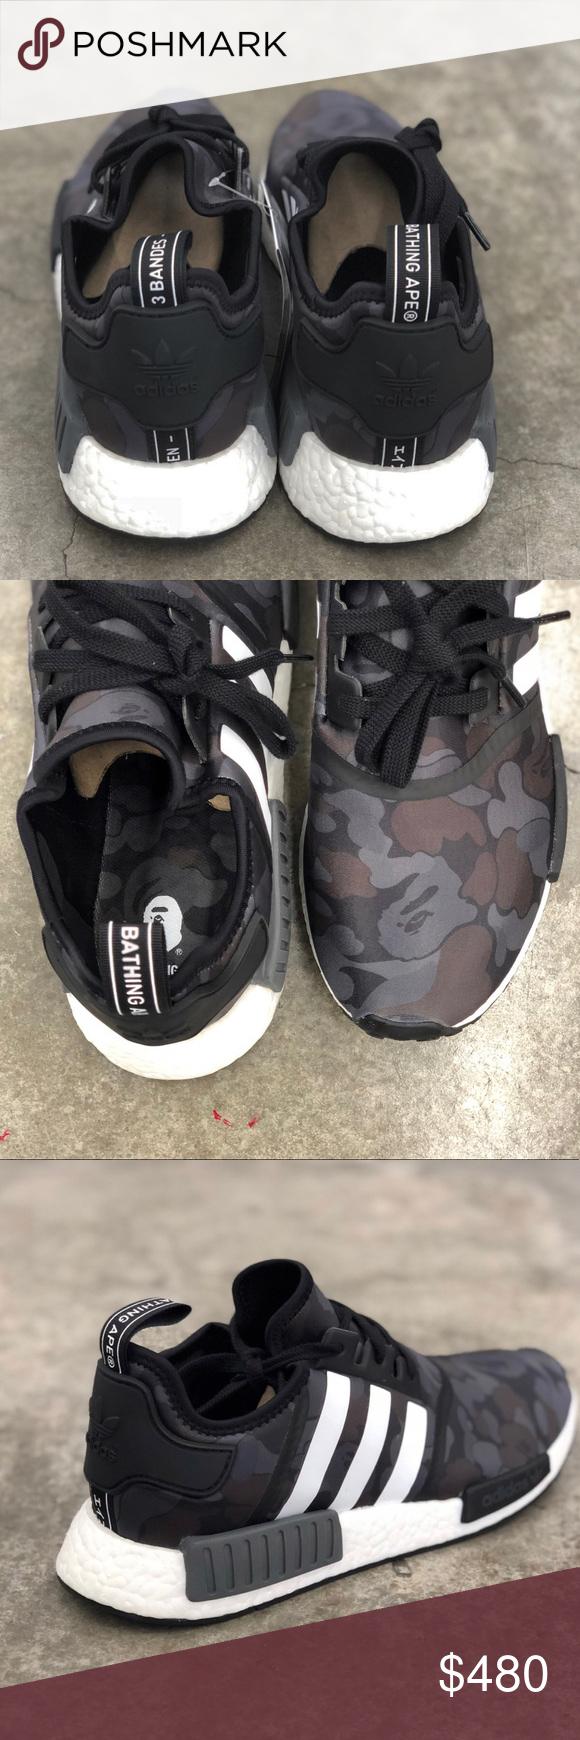 a71a2a80 Adidas NMD R1 Bape Black Camo Dead Stock Brand New No Trades adidas Shoes  Athletic Shoes